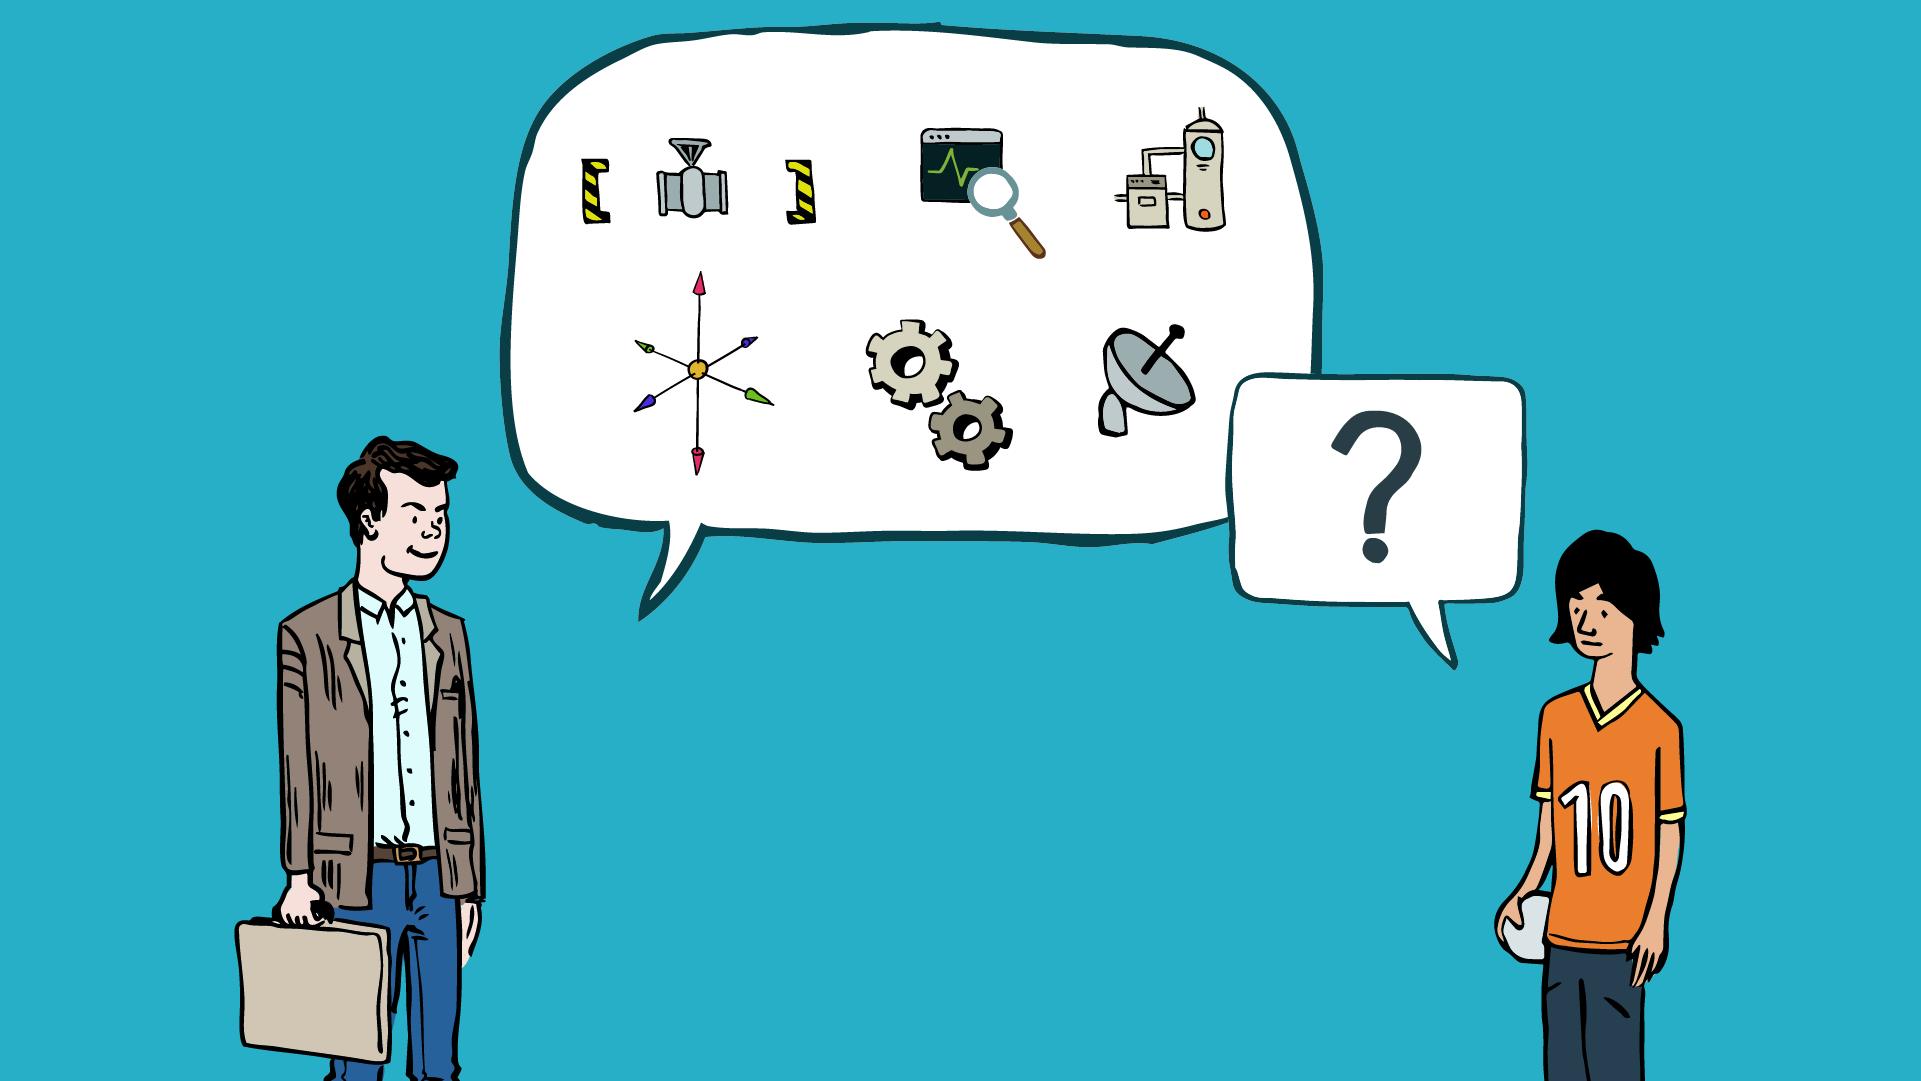 Illustrations_13_Blog_Video-explicative_Jargon-01